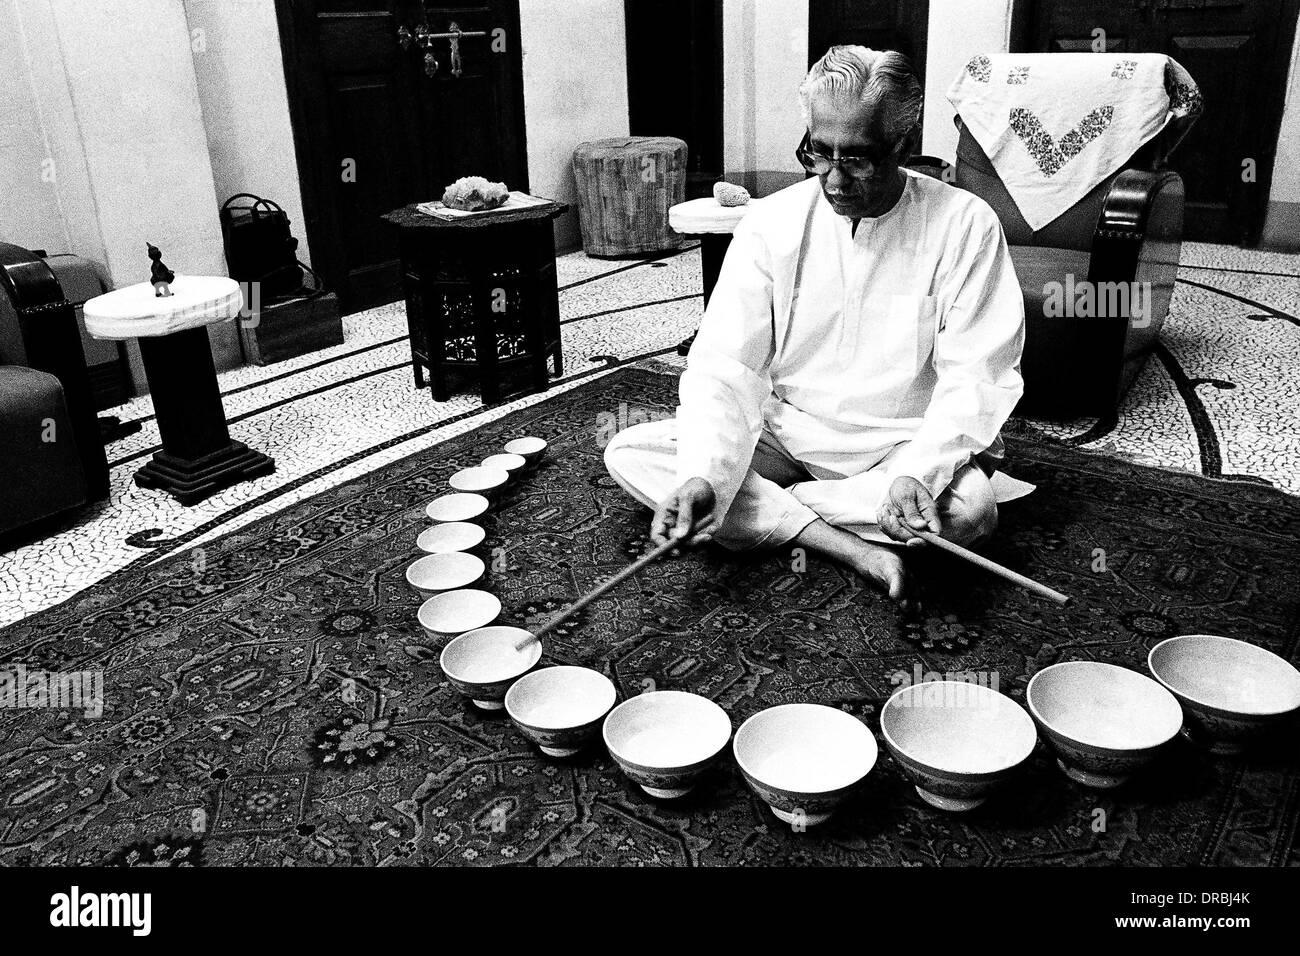 PSI President Ranjit Madhavji playing Jal Tarang melodic percussion instrument striking ceramic bowls with beaters Stock Photo